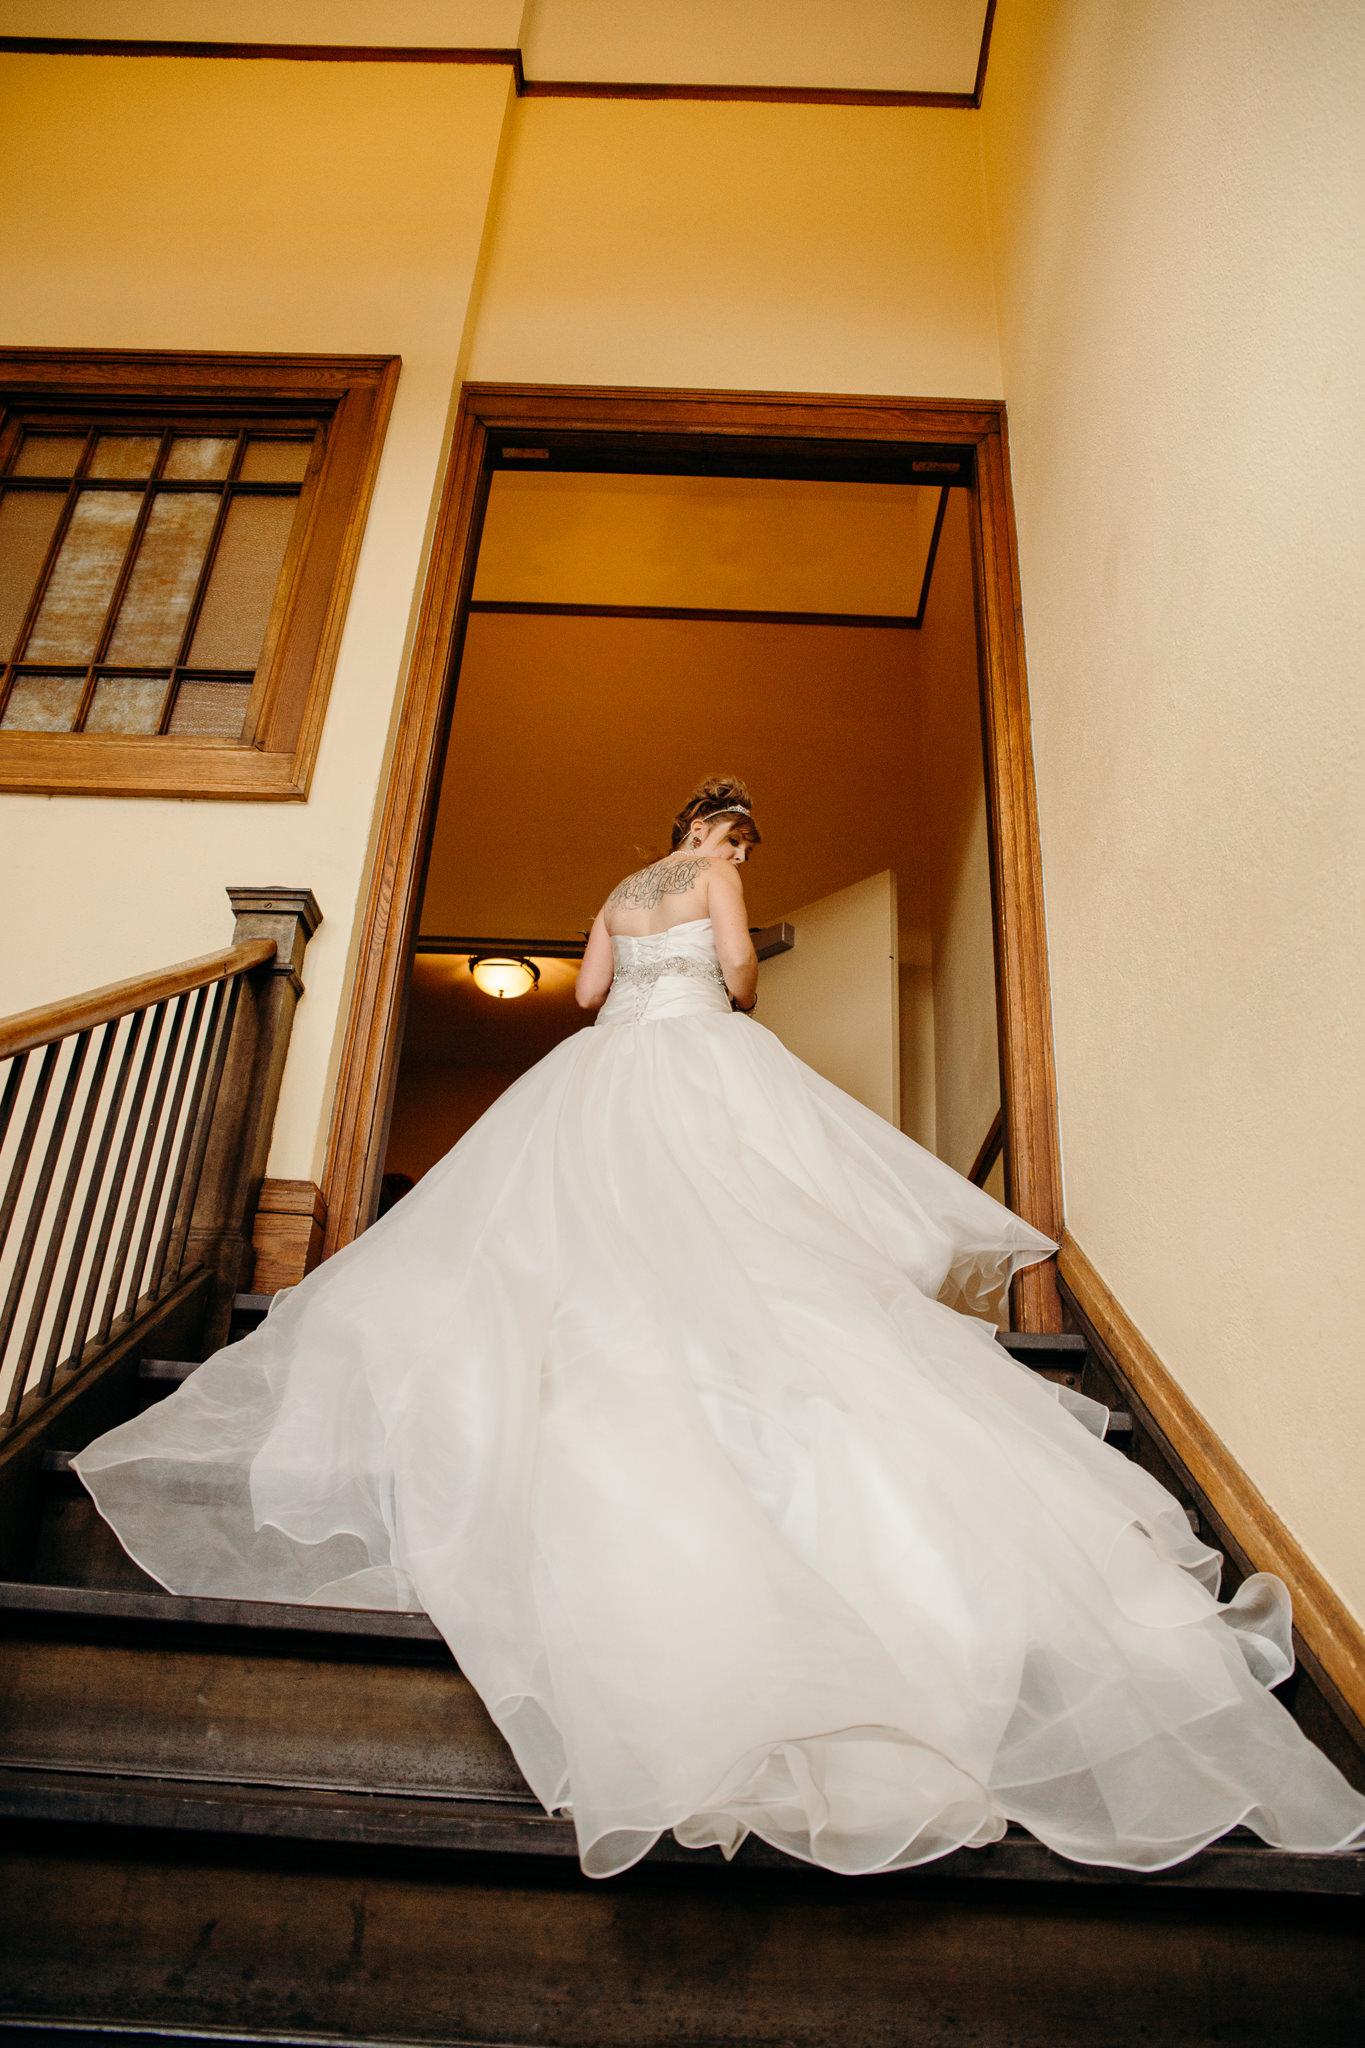 Grant Beachy Photo portrait wedding goshen elkhart south bend chicago-021.jpg